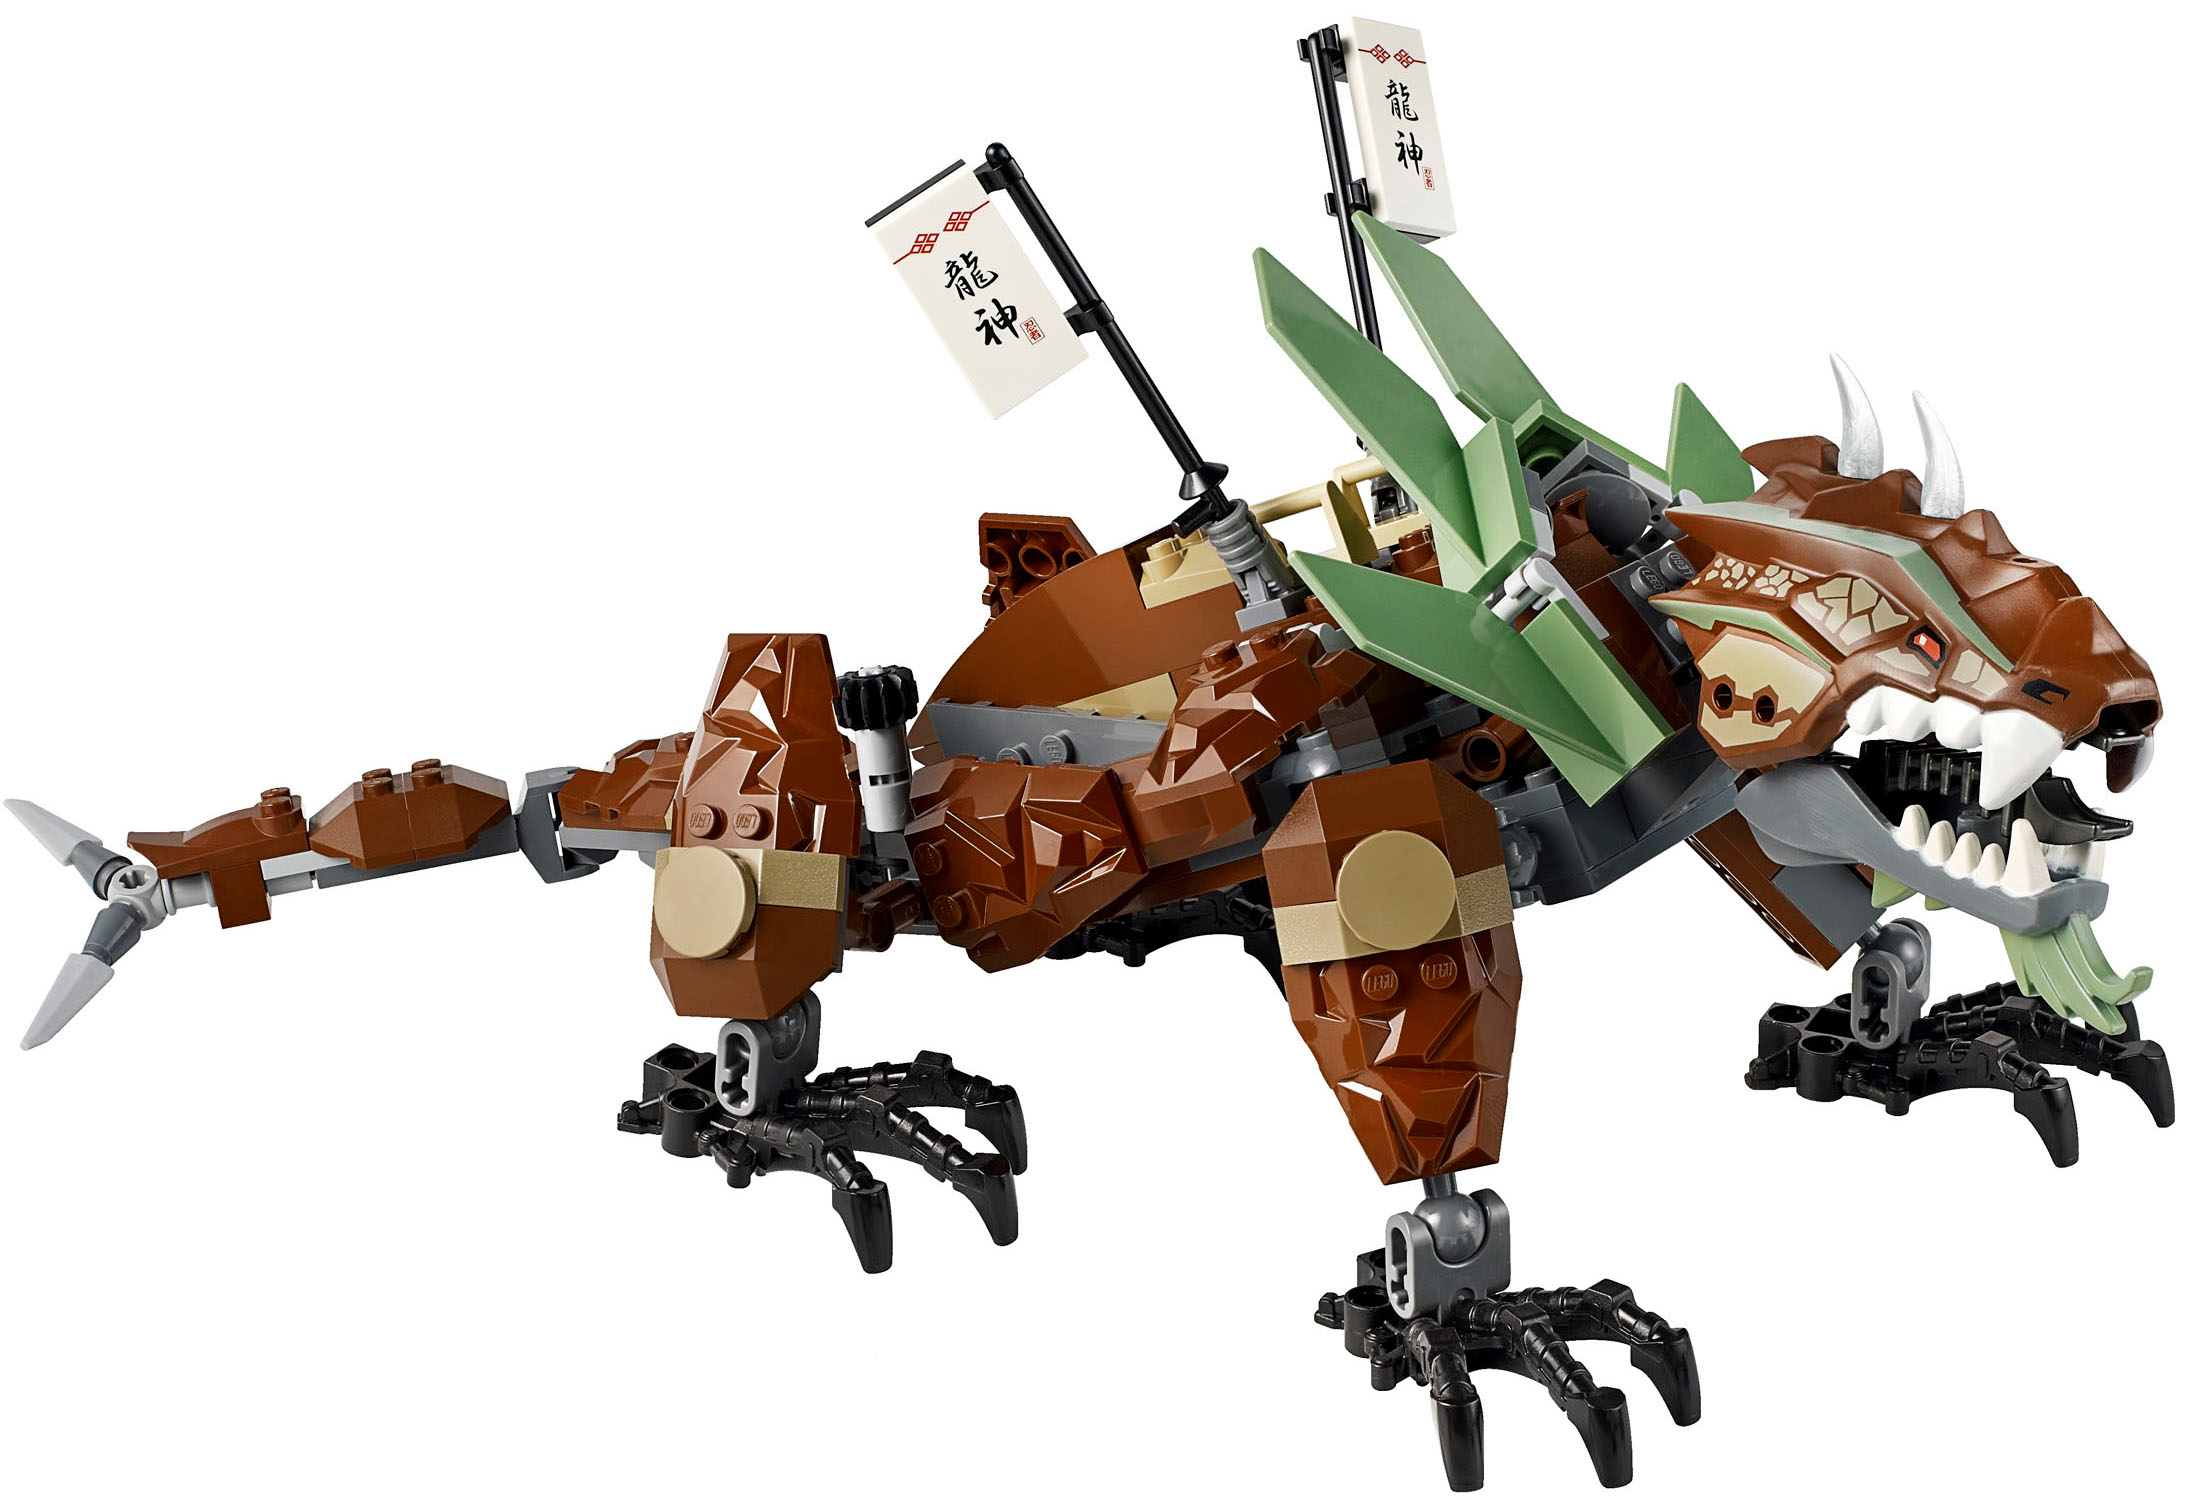 lego ninjago earth dragon defence 2509 toys zavvi. Black Bedroom Furniture Sets. Home Design Ideas